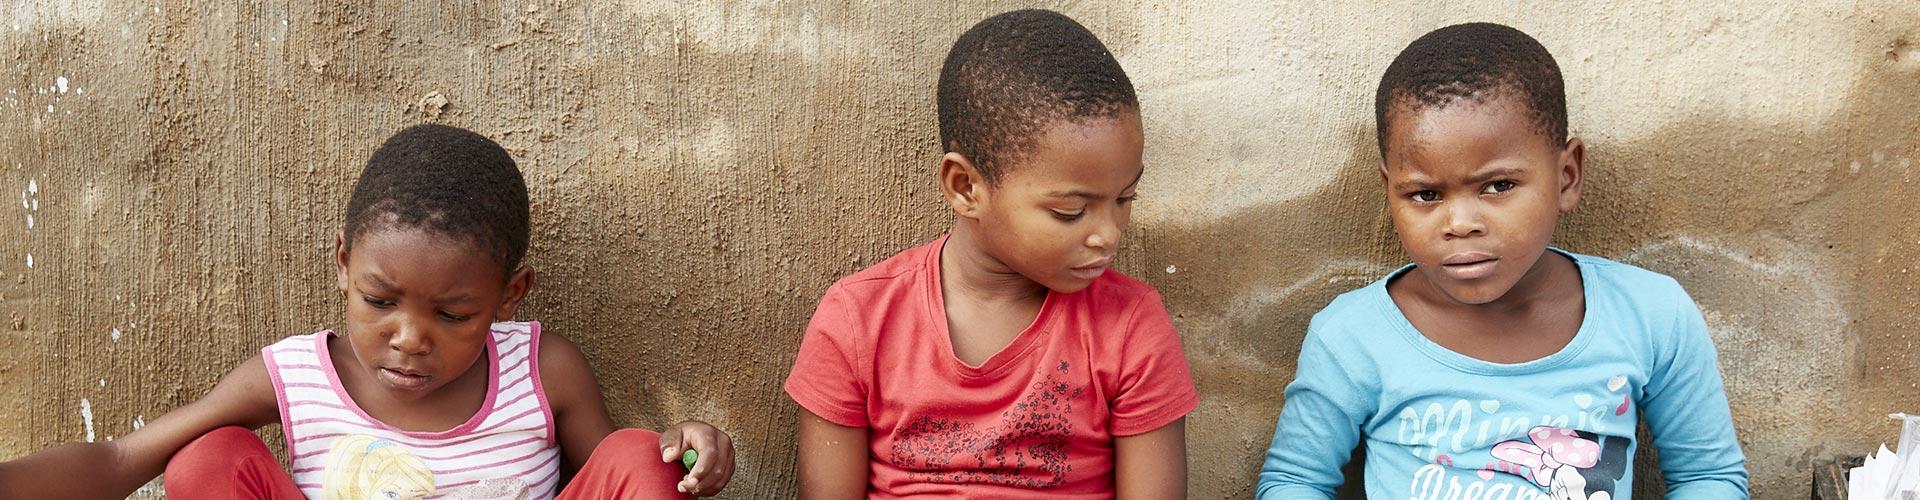 SOS Kinderdörfer – South Africa, Mamelodi